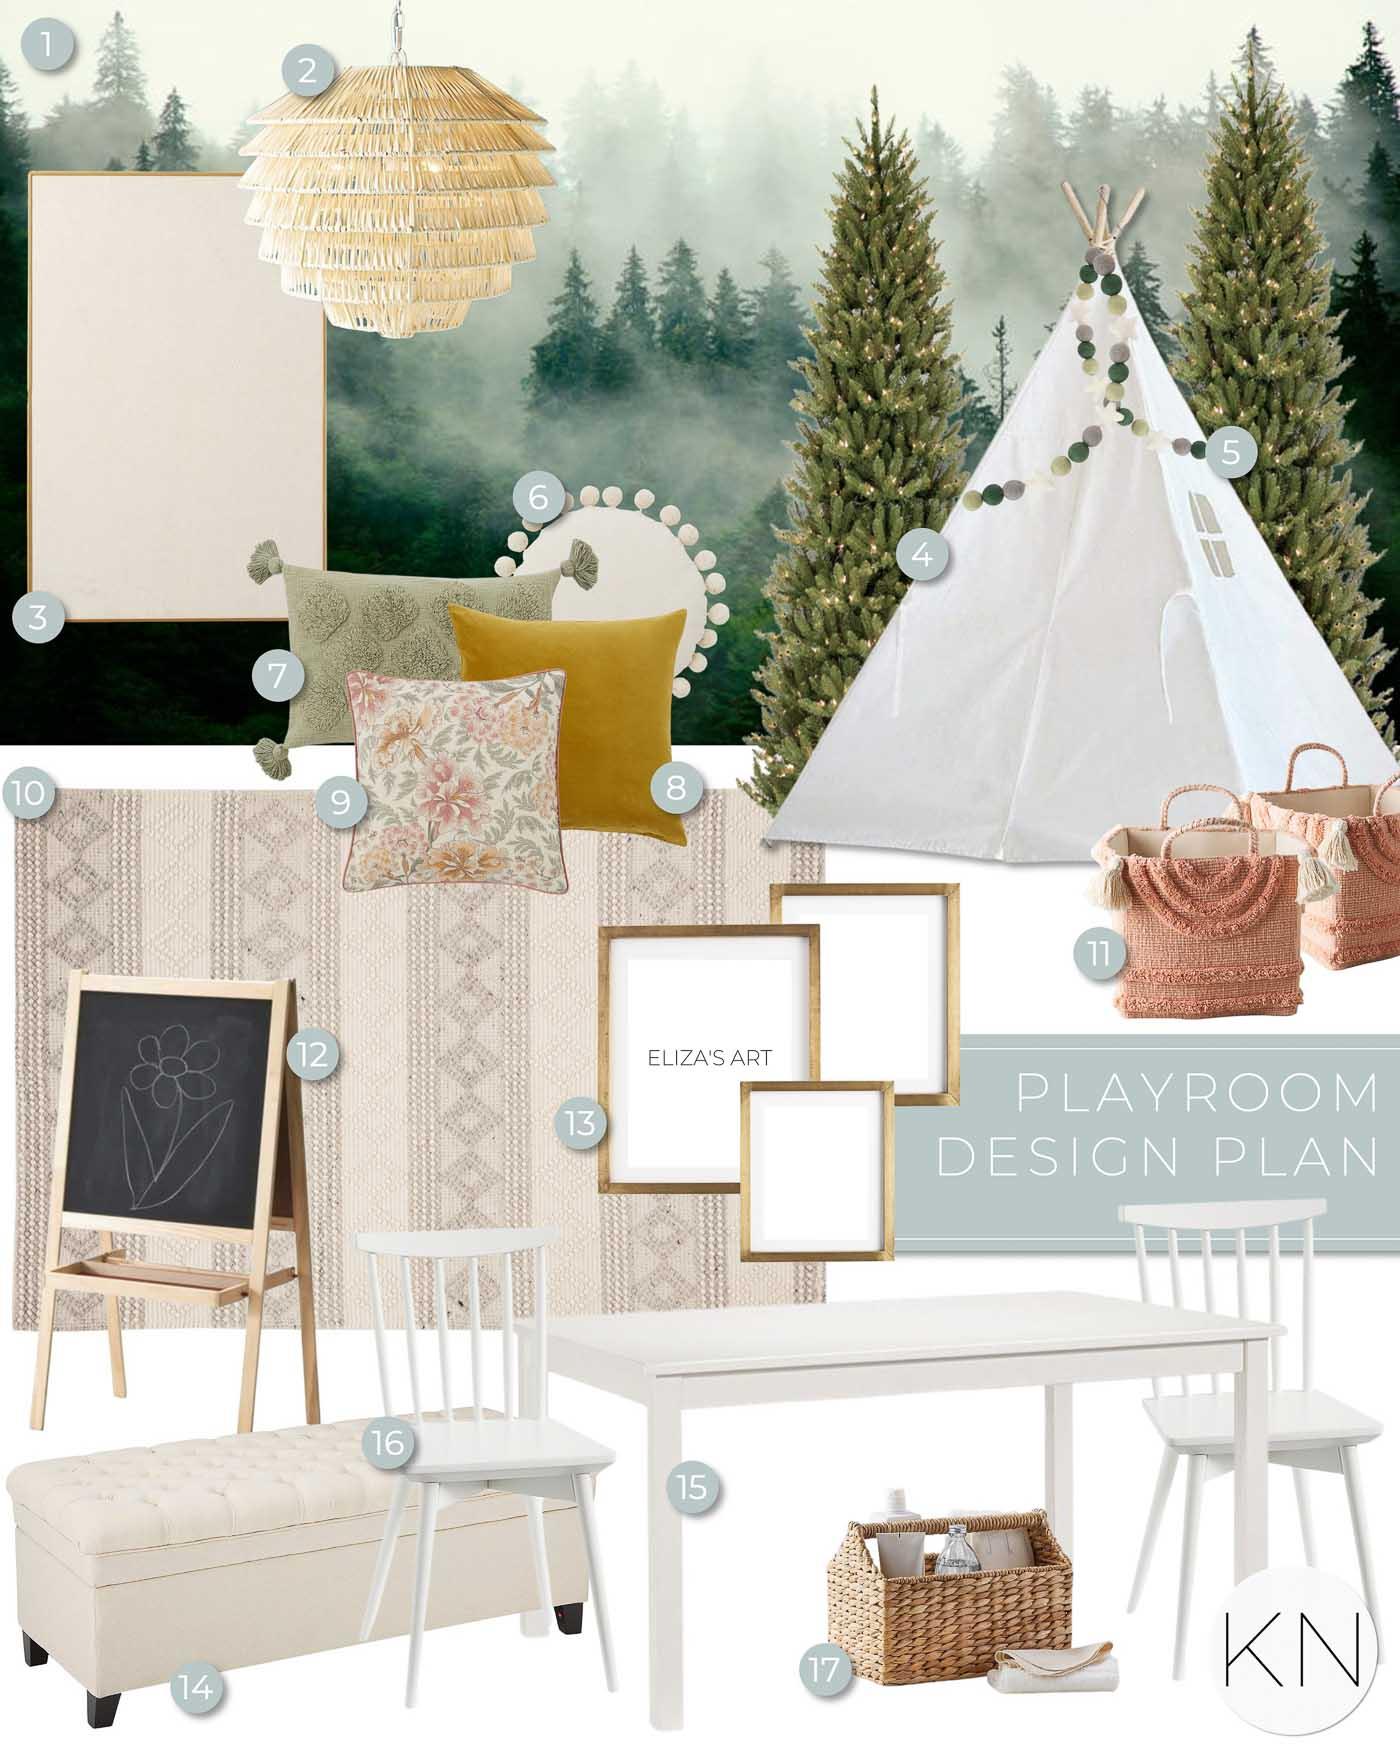 Girls forest playroom design